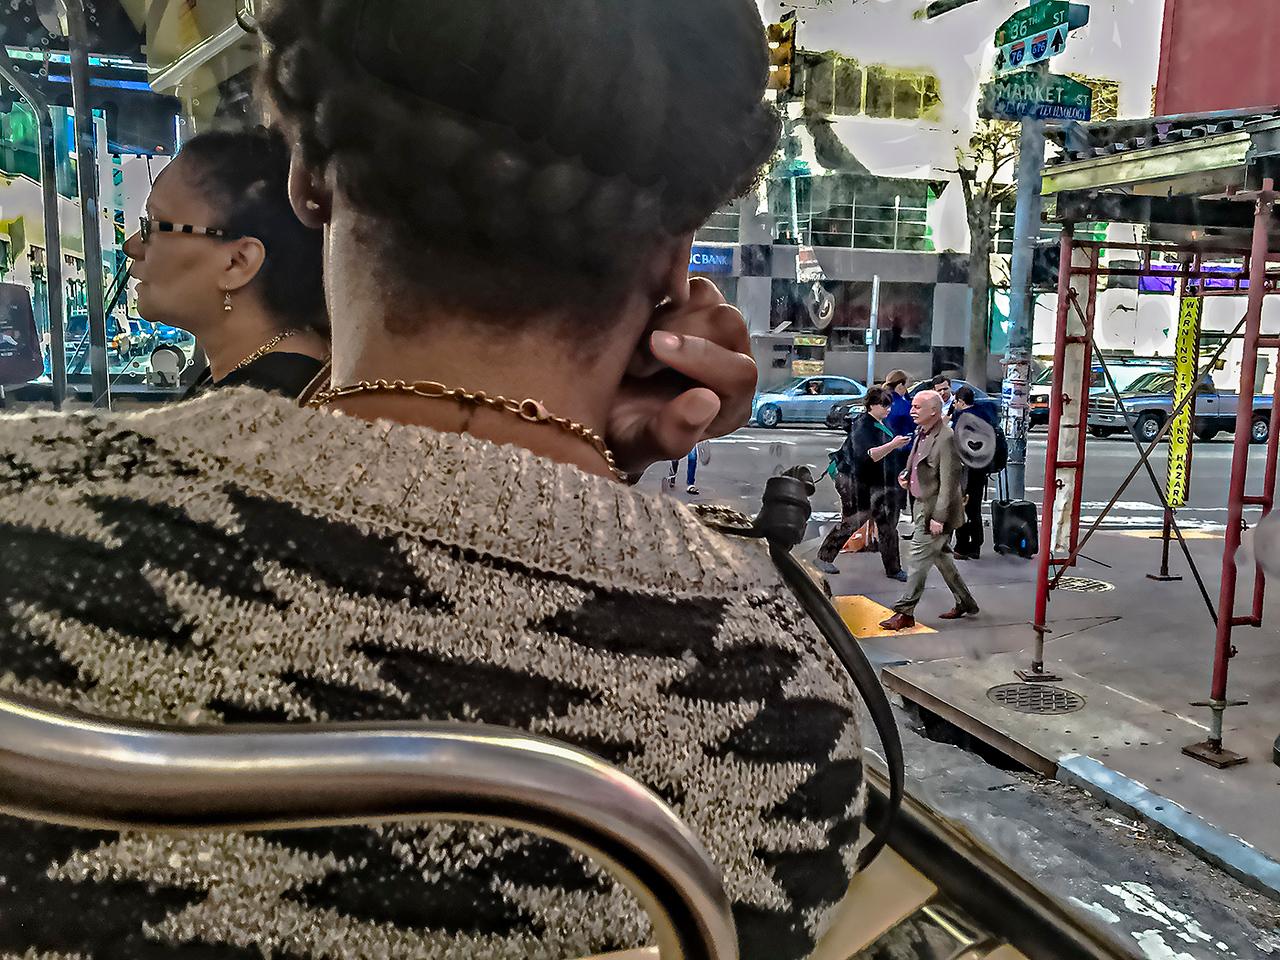 Trolley, Pedestrians, University City